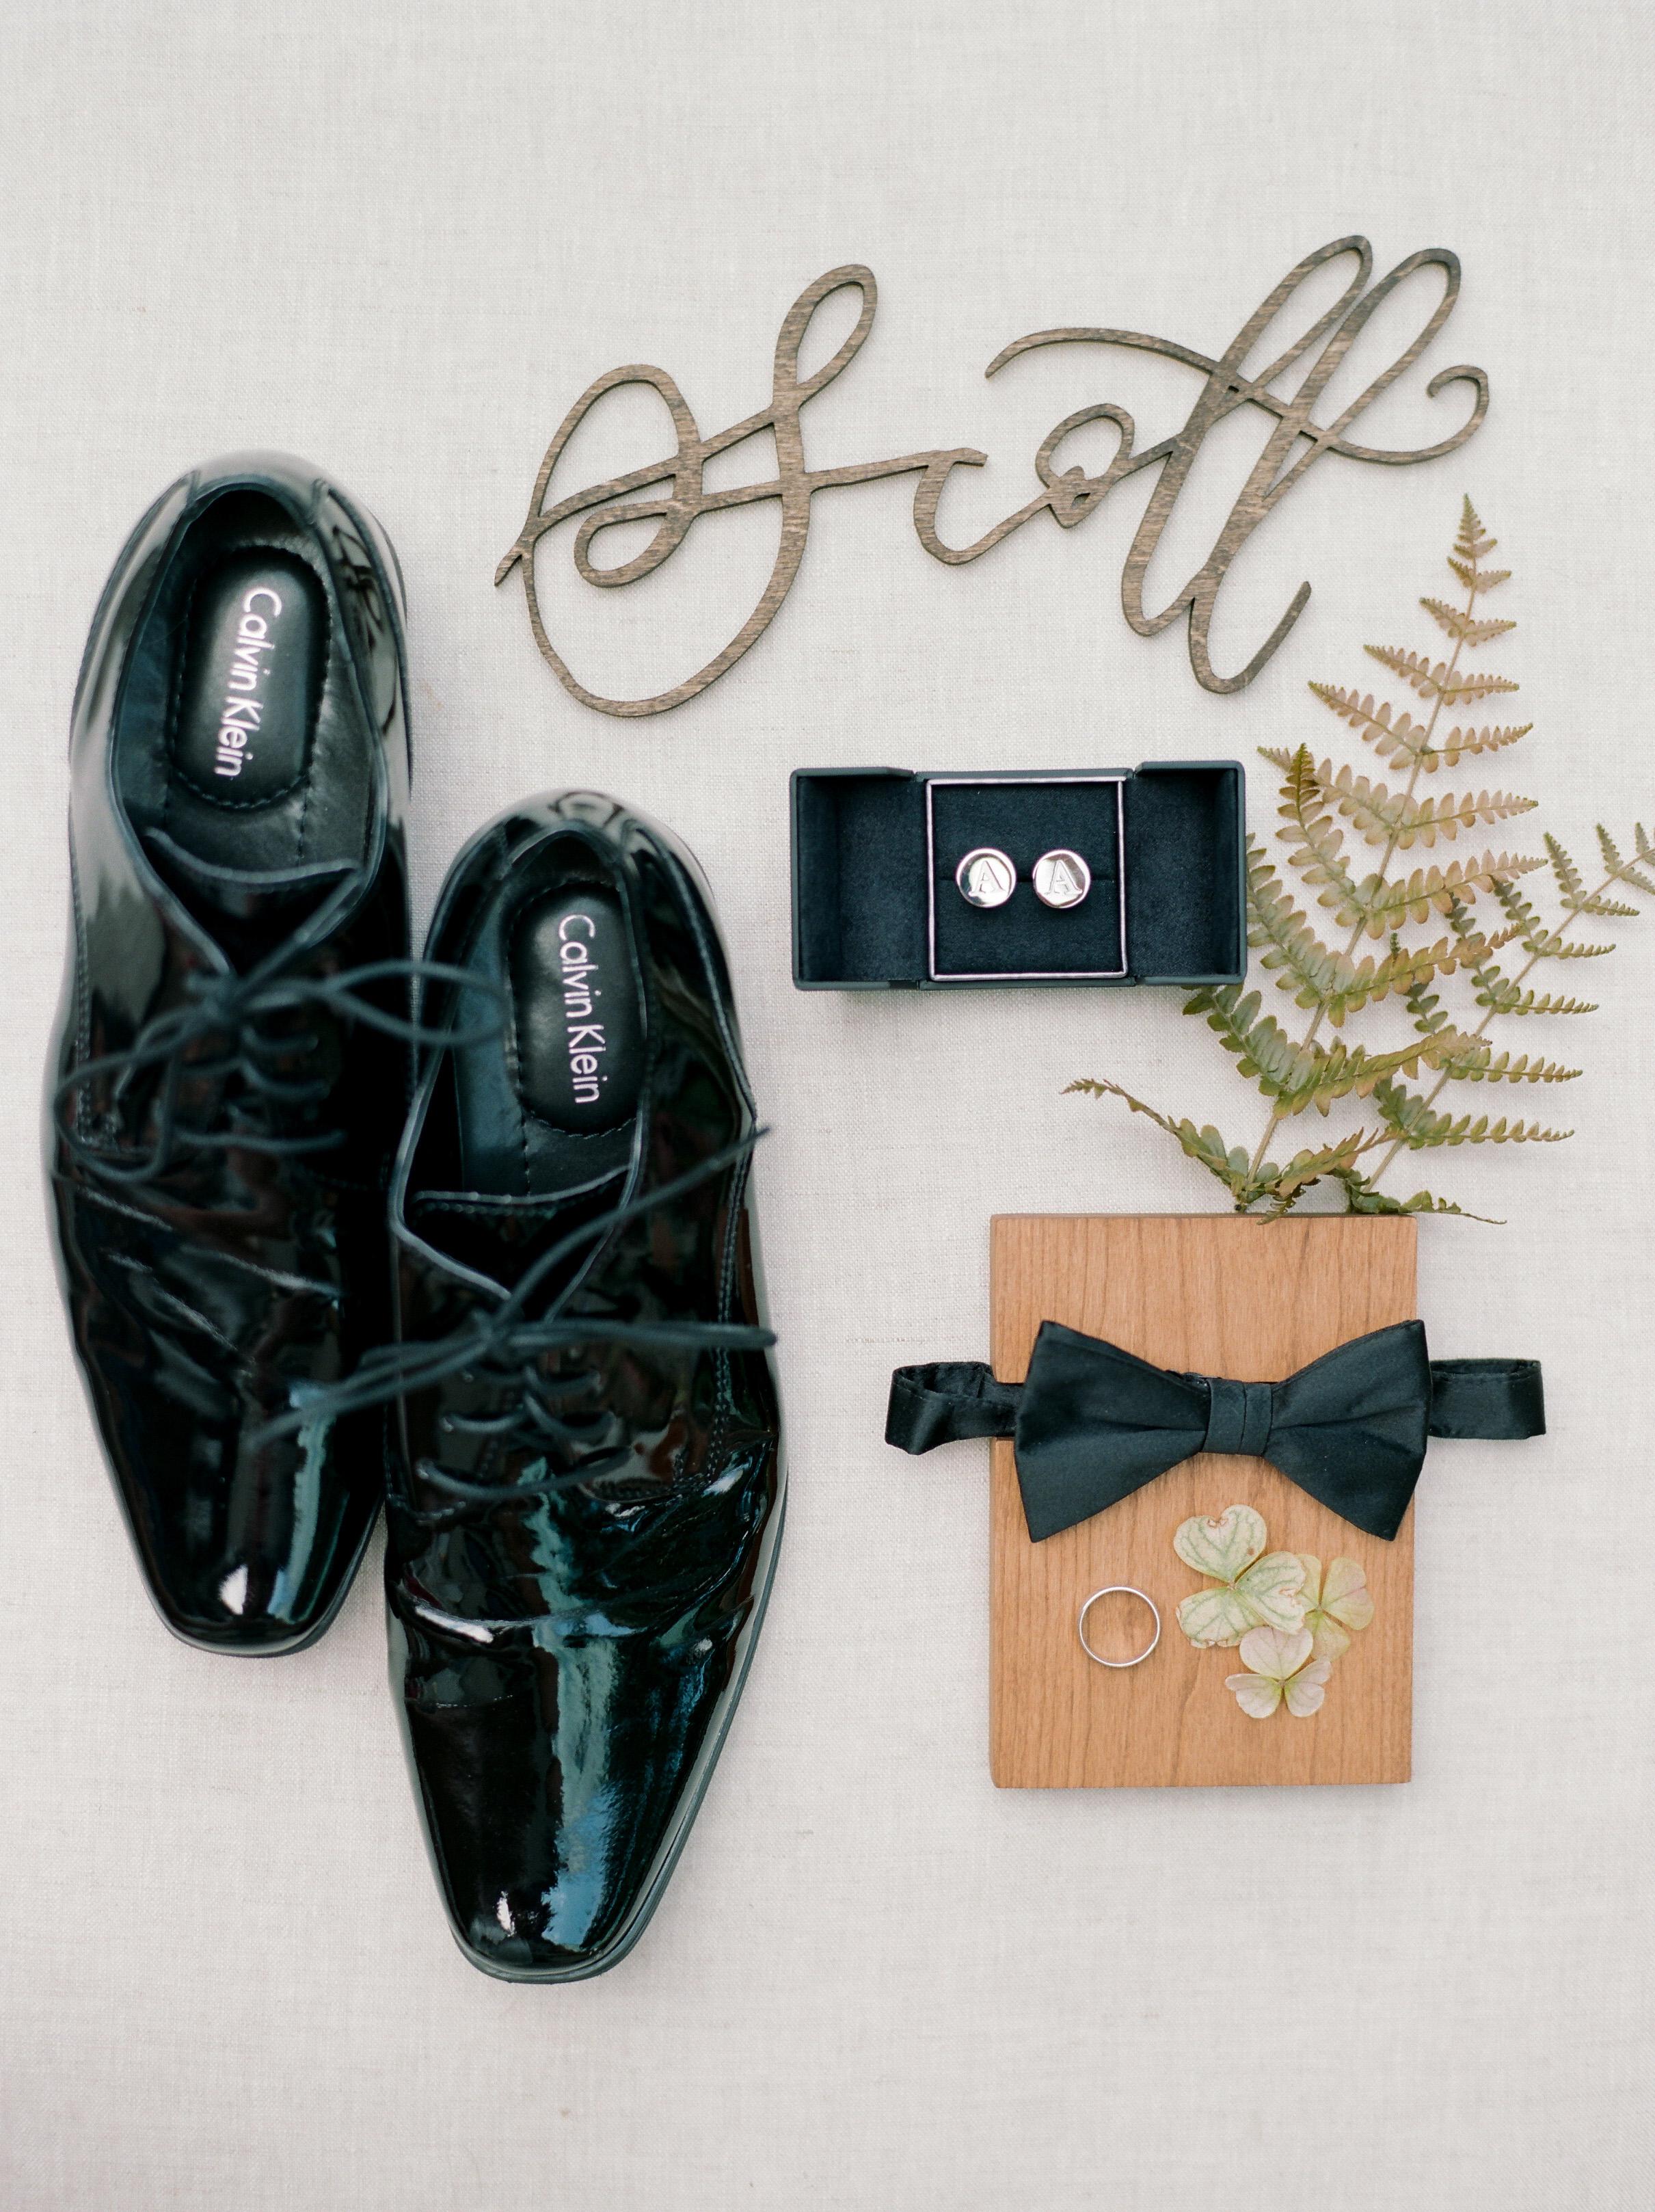 The-Knot-Texas-Fine-Art-Wedding-Film-Destination-Photographer-Houston-Austin-Dallas-New-Orleans-Julia-Ideson-Library-Event-Dana-Josh-Fernandez-Photograph-Top-Best-12.jpg